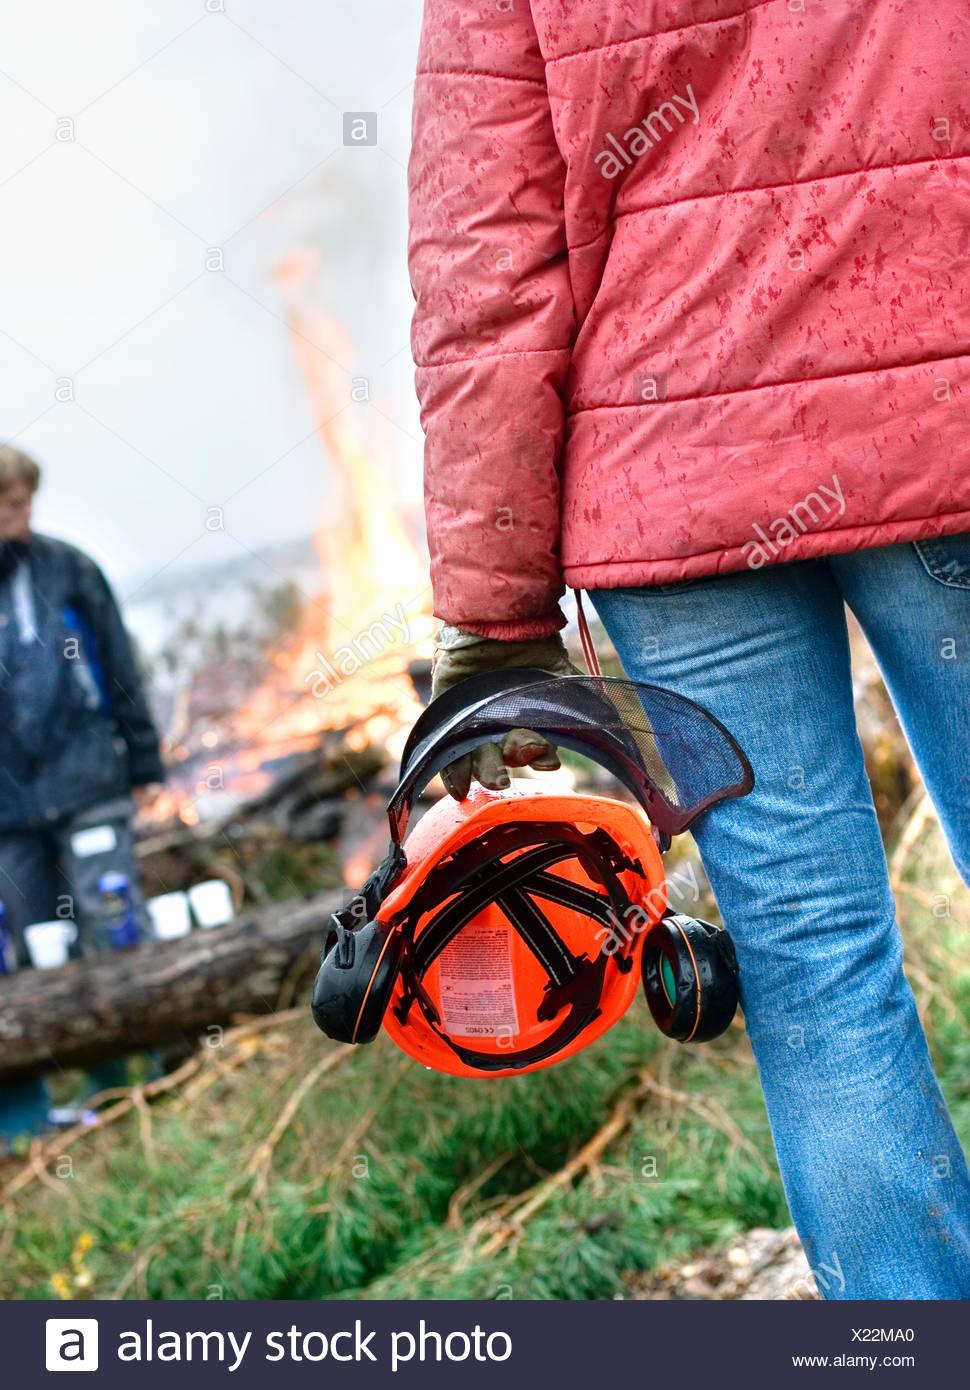 Sweden, Bohuslan, Tjorn, Man holding safety helmet - Stock Image